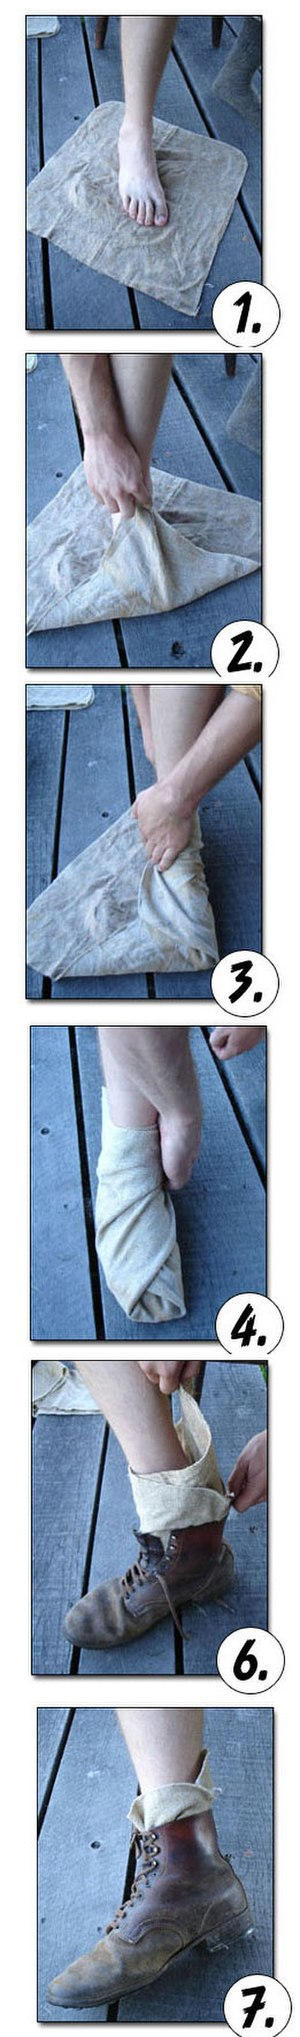 Footwraps - Putting on footwraps